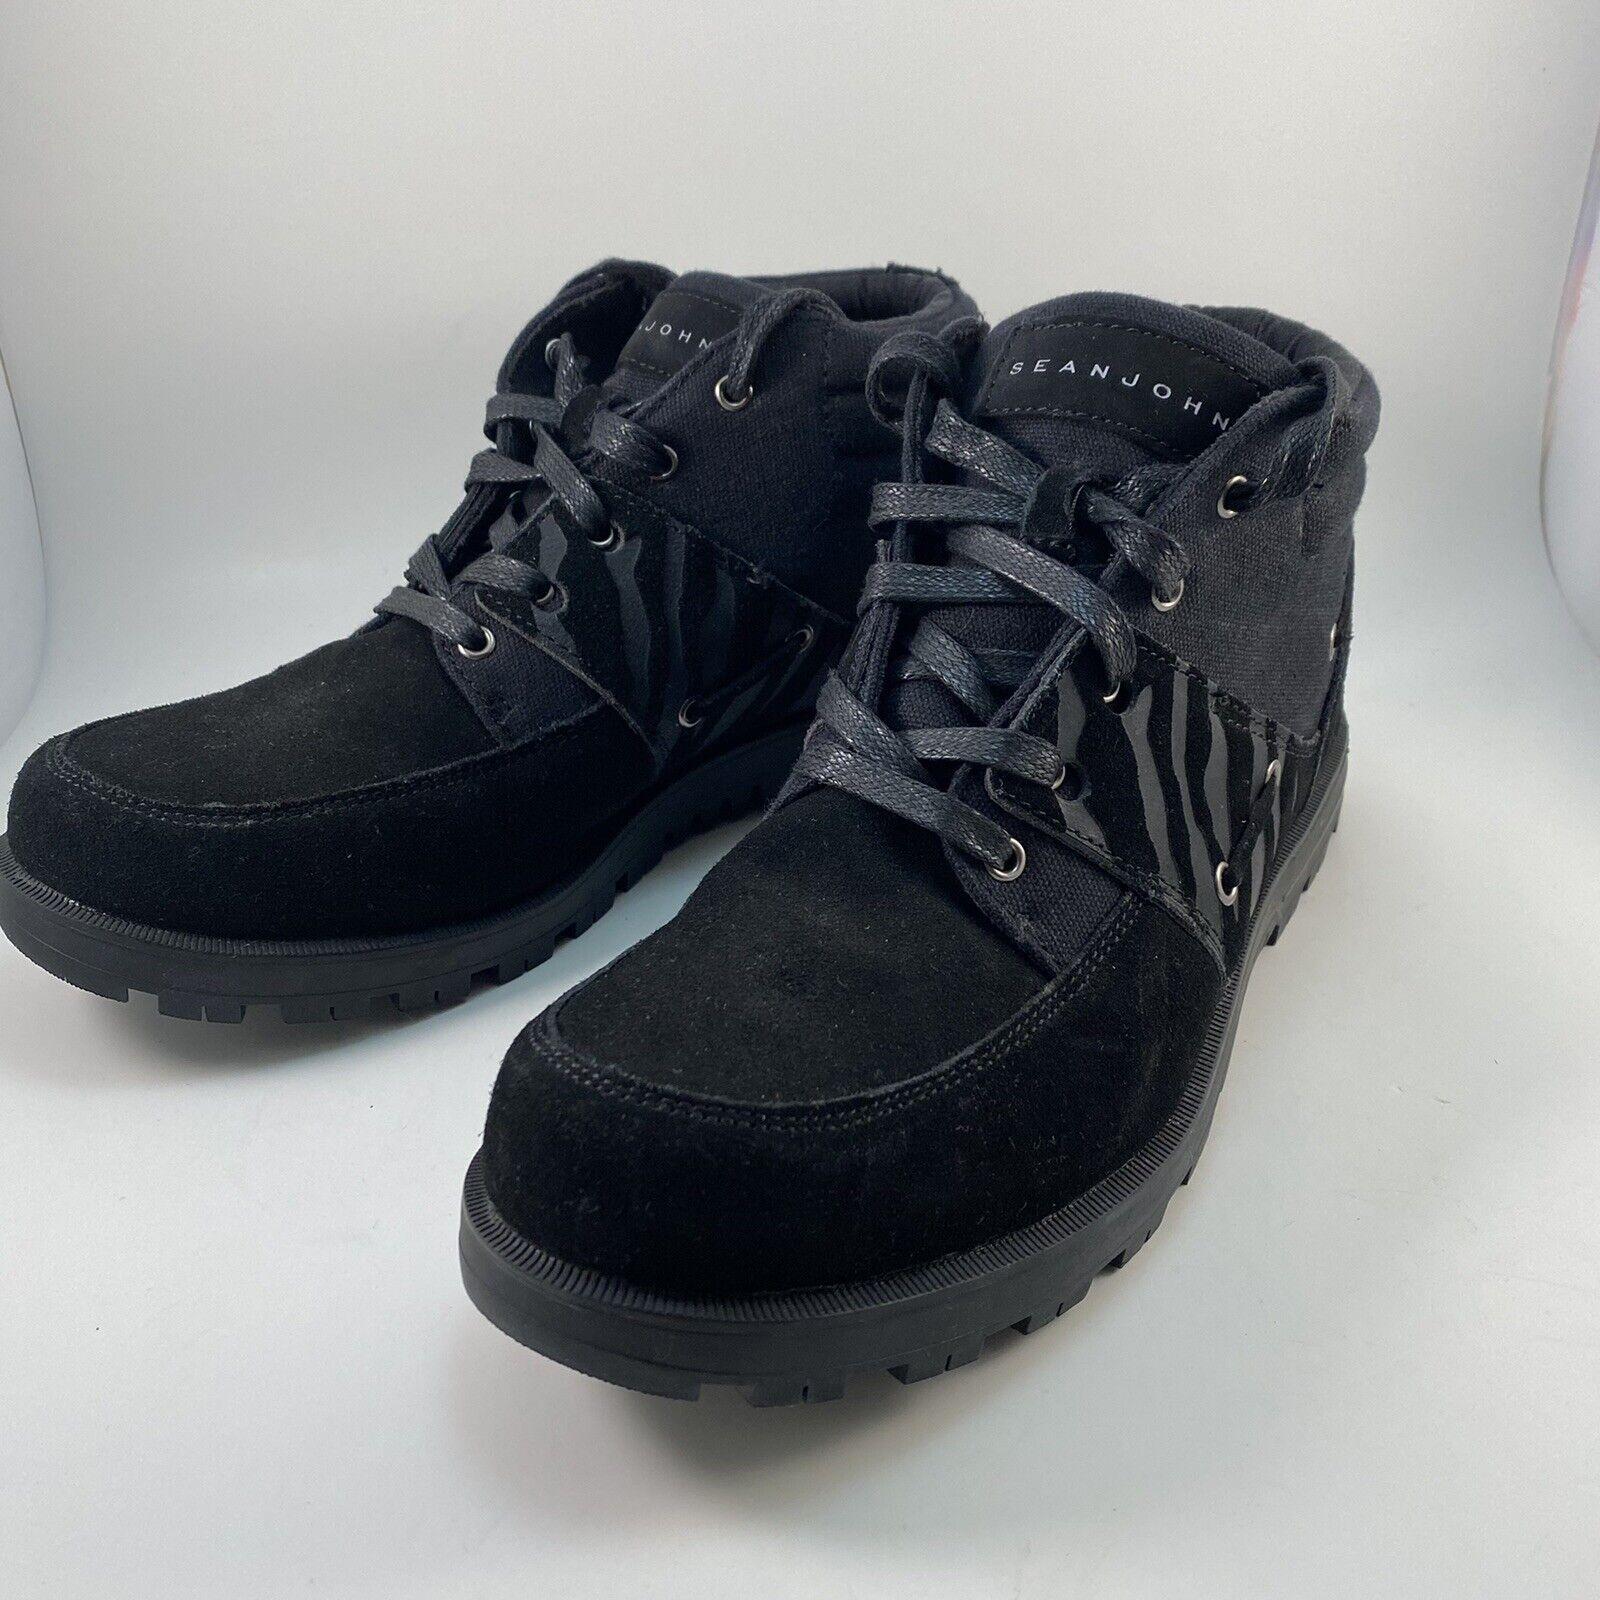 New Sean John Hardlined Size 10 Men's Boots Black With Zebra Details